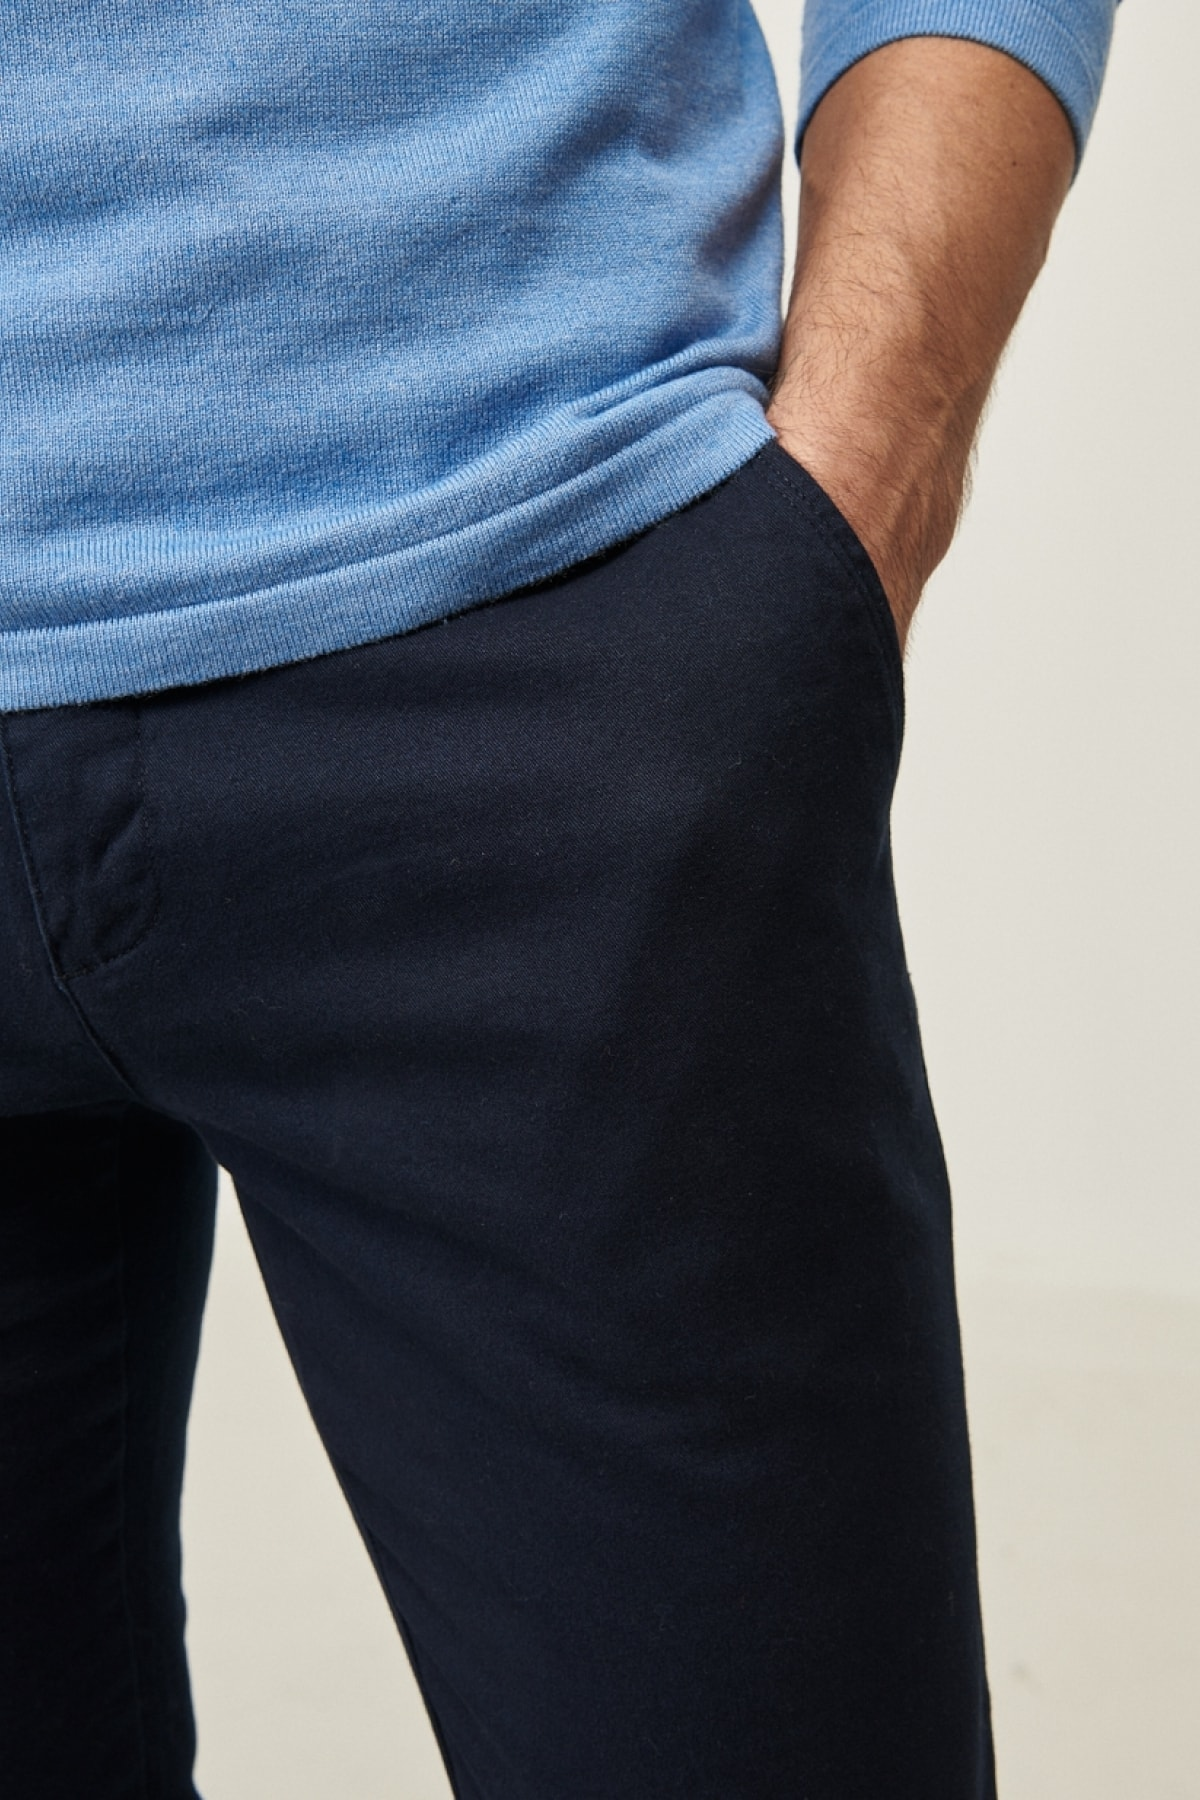 AC&Co / Altınyıldız Classics Erkek Lacivert Kanvas Slim Fit Dar Kesim Yan Cep Chino Pantolon 2